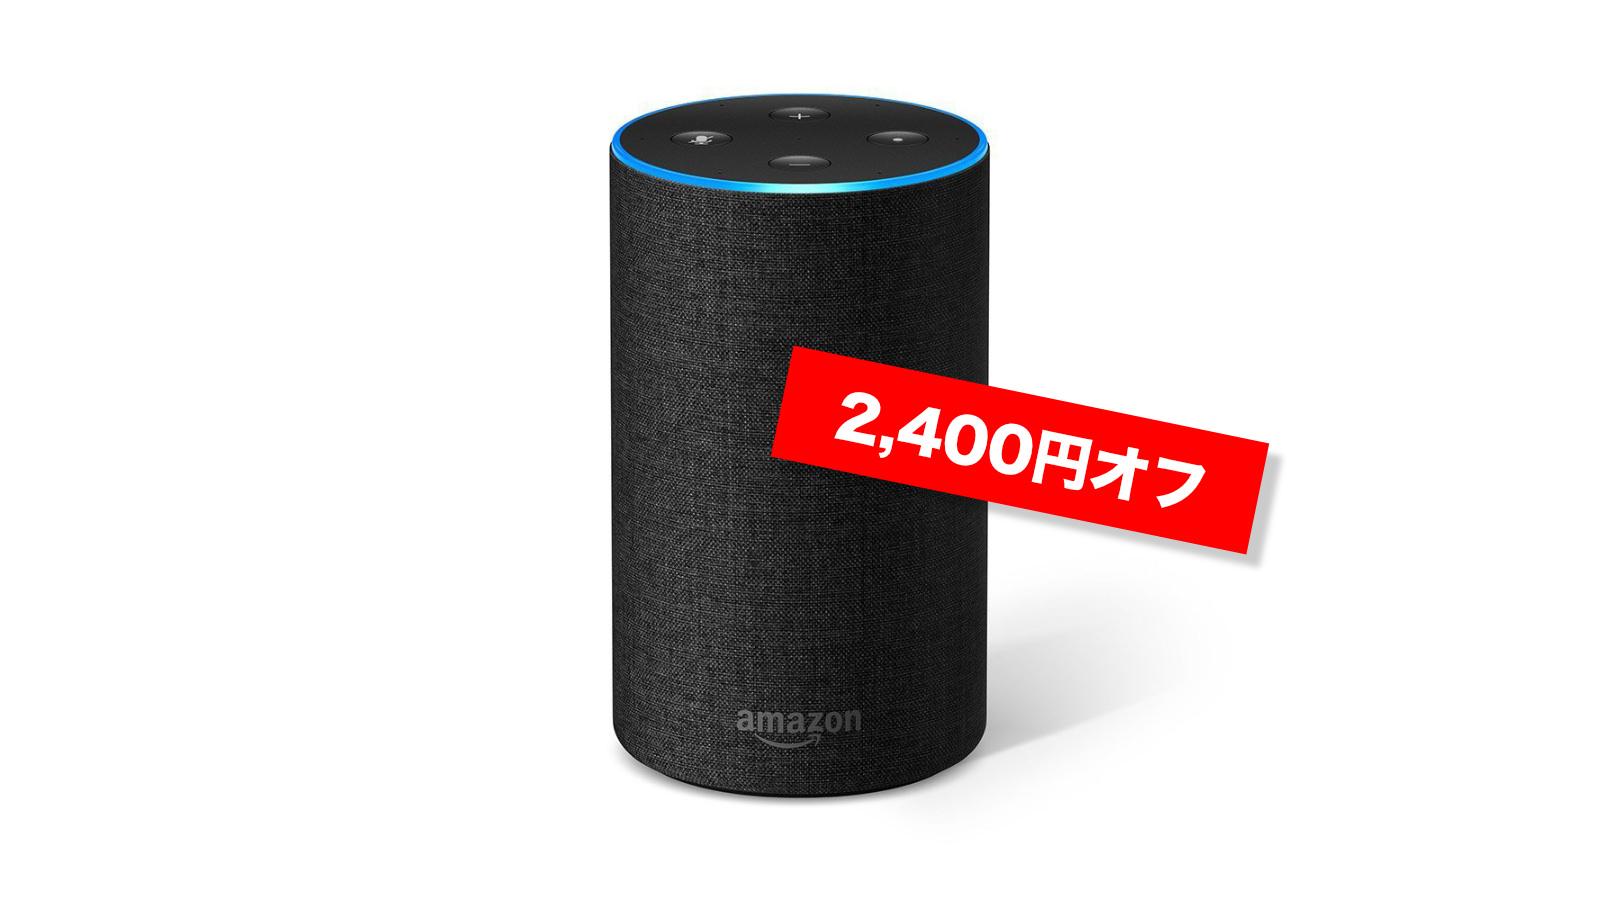 Amazon-Echo-2400yen-off.jpg